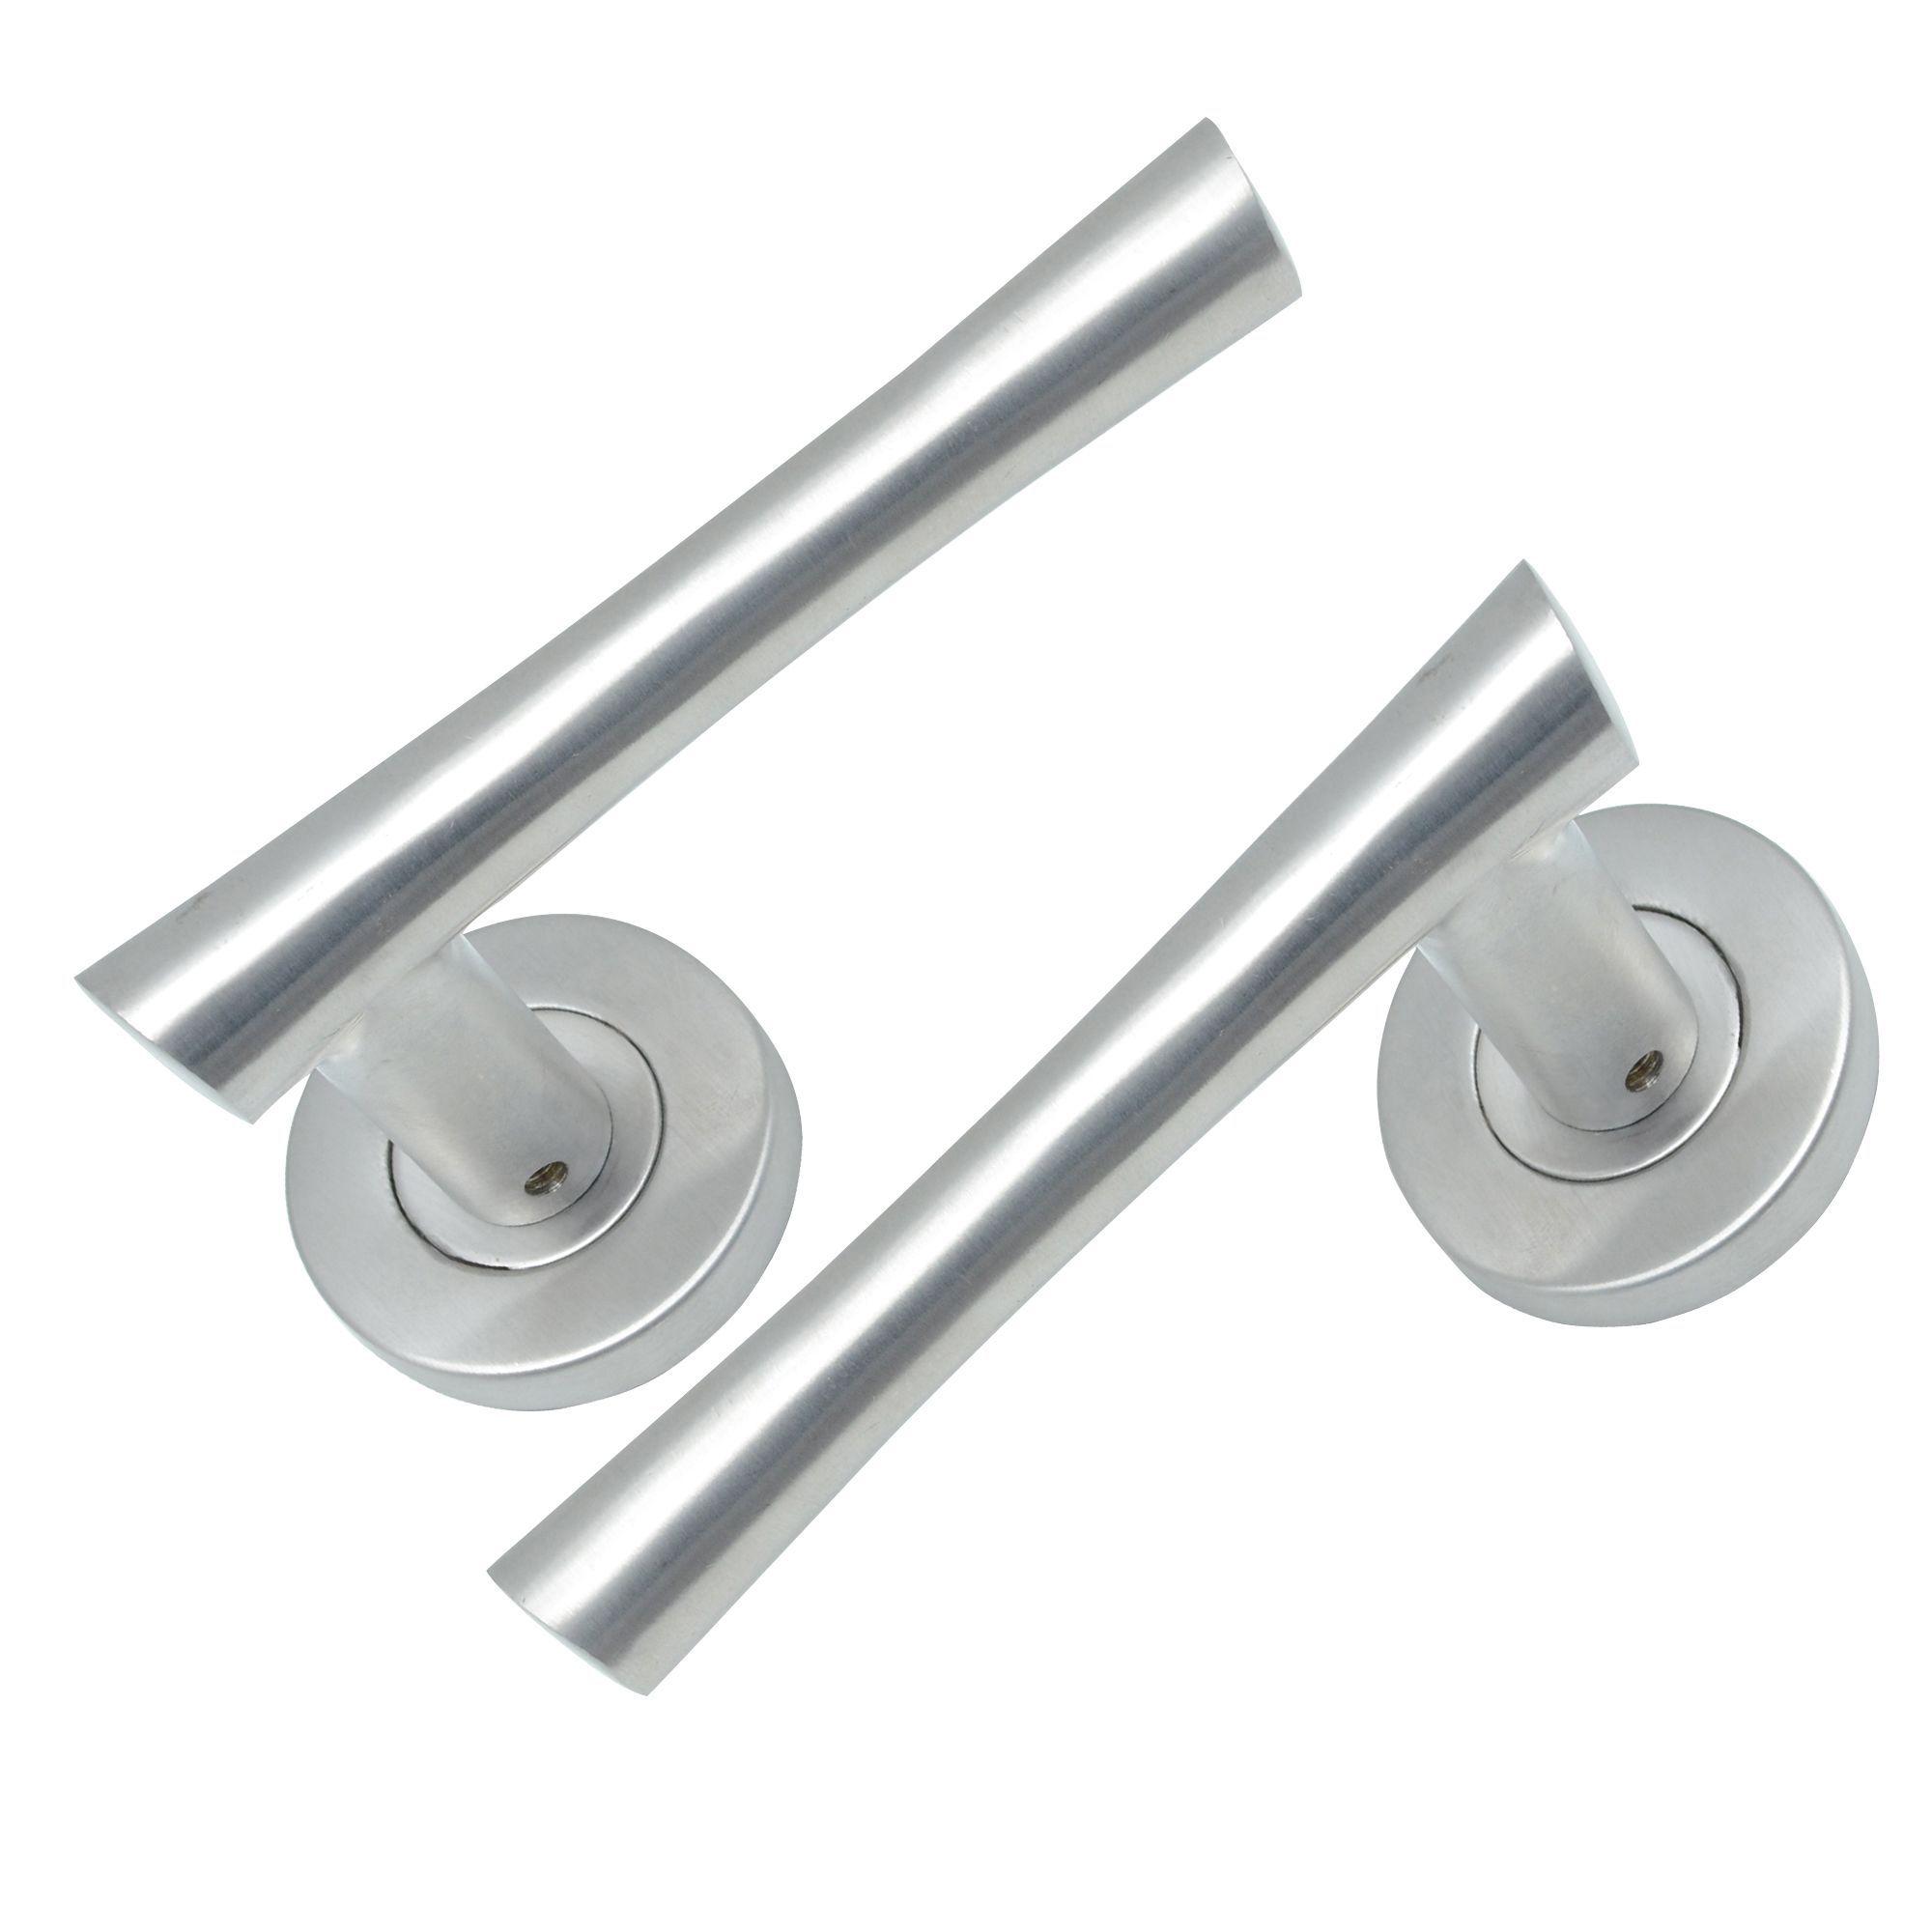 Satin Stainless Steel Effect Internal Straight Latch Door Handle, 1 Set